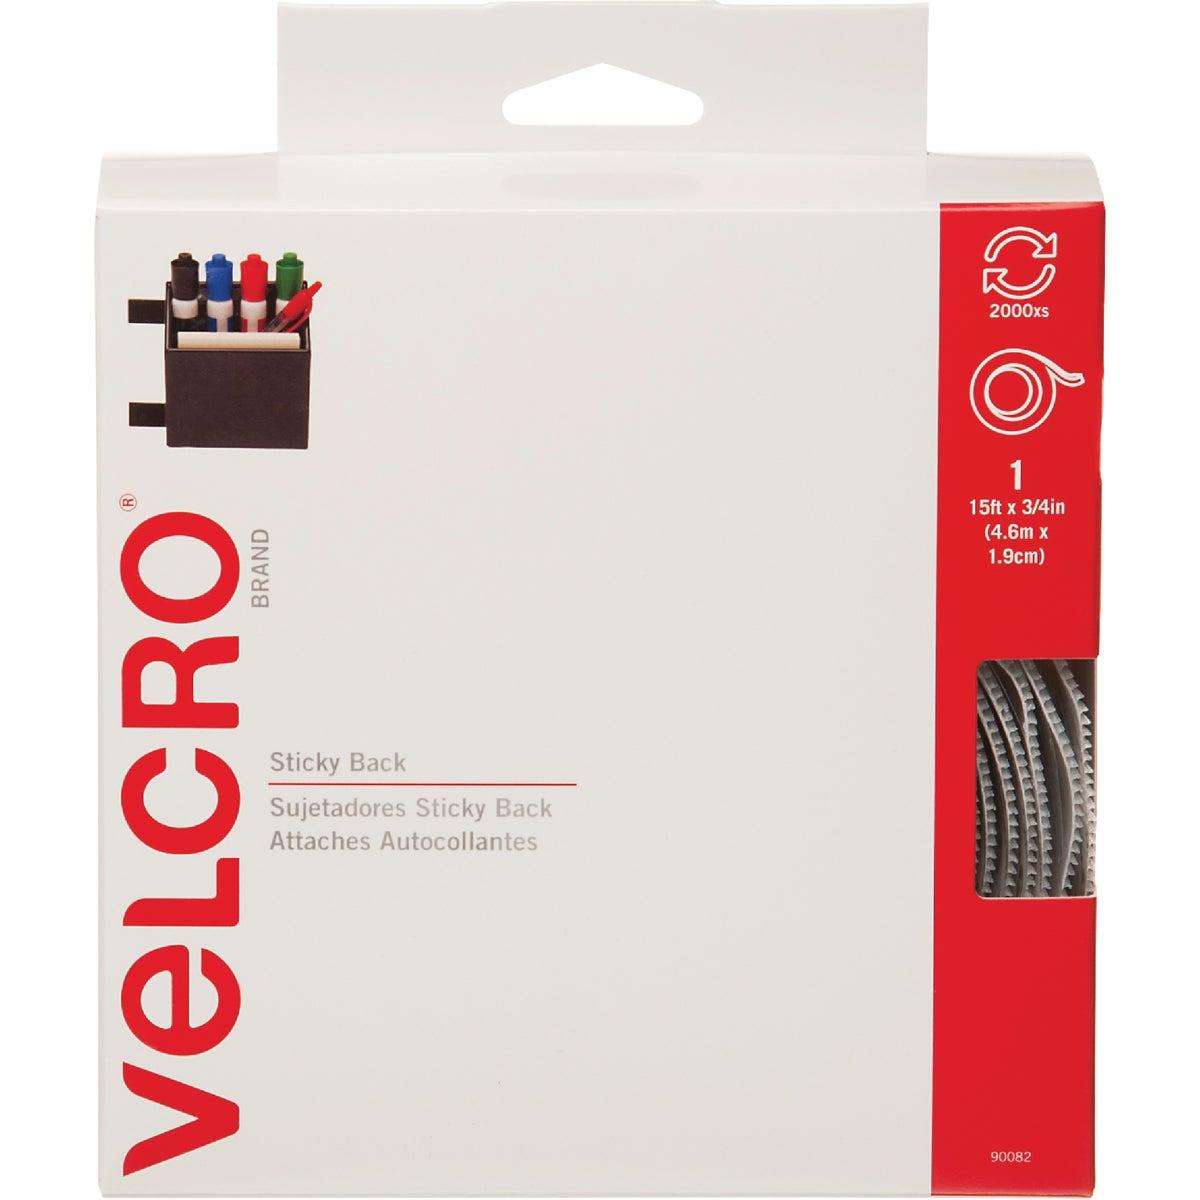 5YD WHT ADHSVE FASTENER - 90082 by Velcro Usa